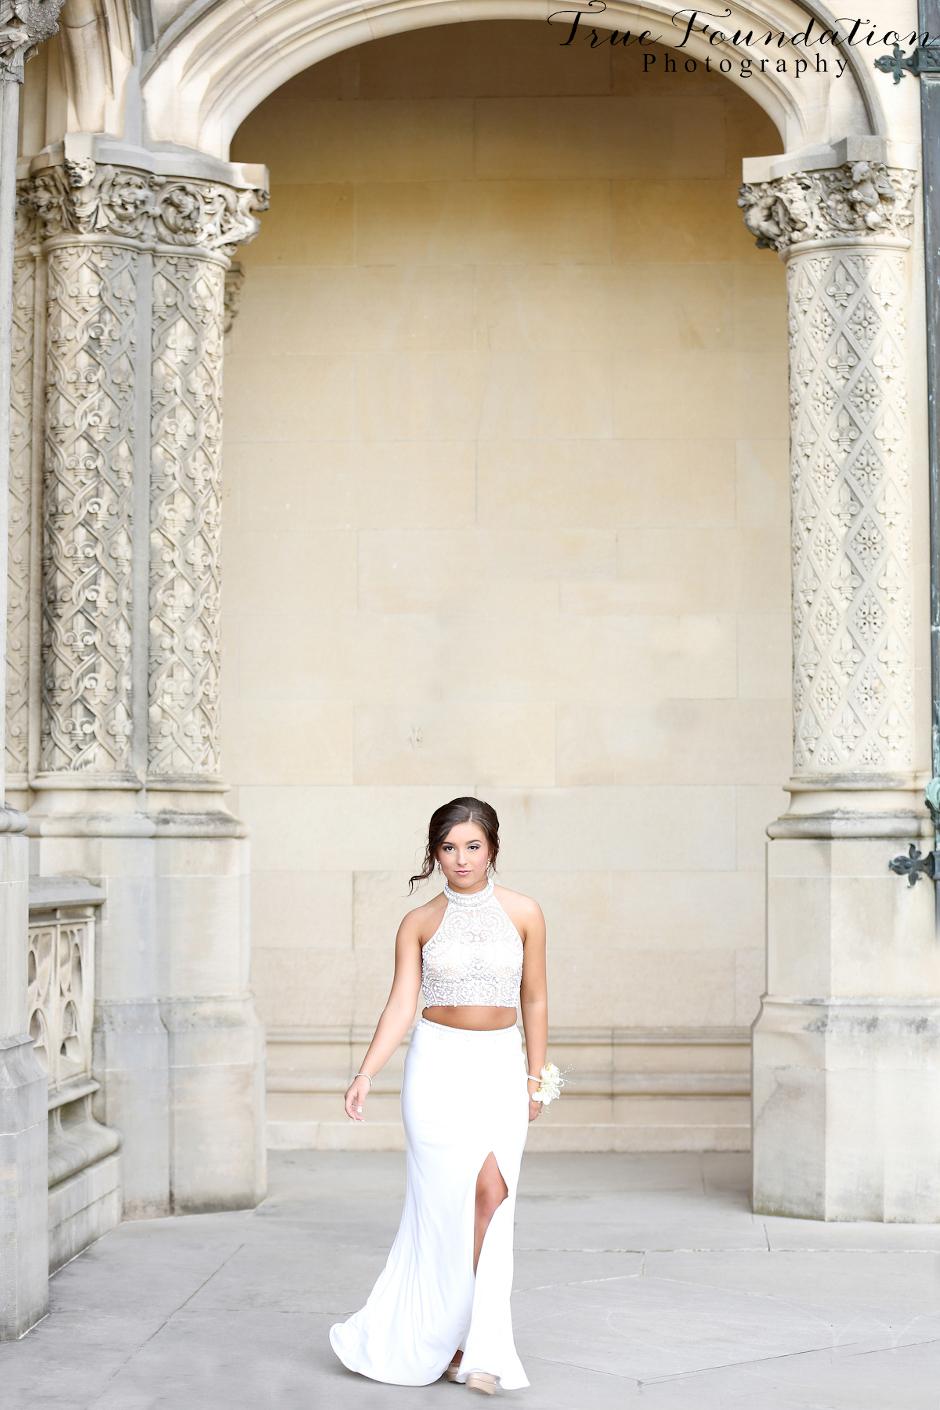 Senior - Prom - Photography - Photos - North - Carolina - NC - Photographer - Biltmore - Hendersonville - Greenville - Charlotte - High - School - Dance (14)